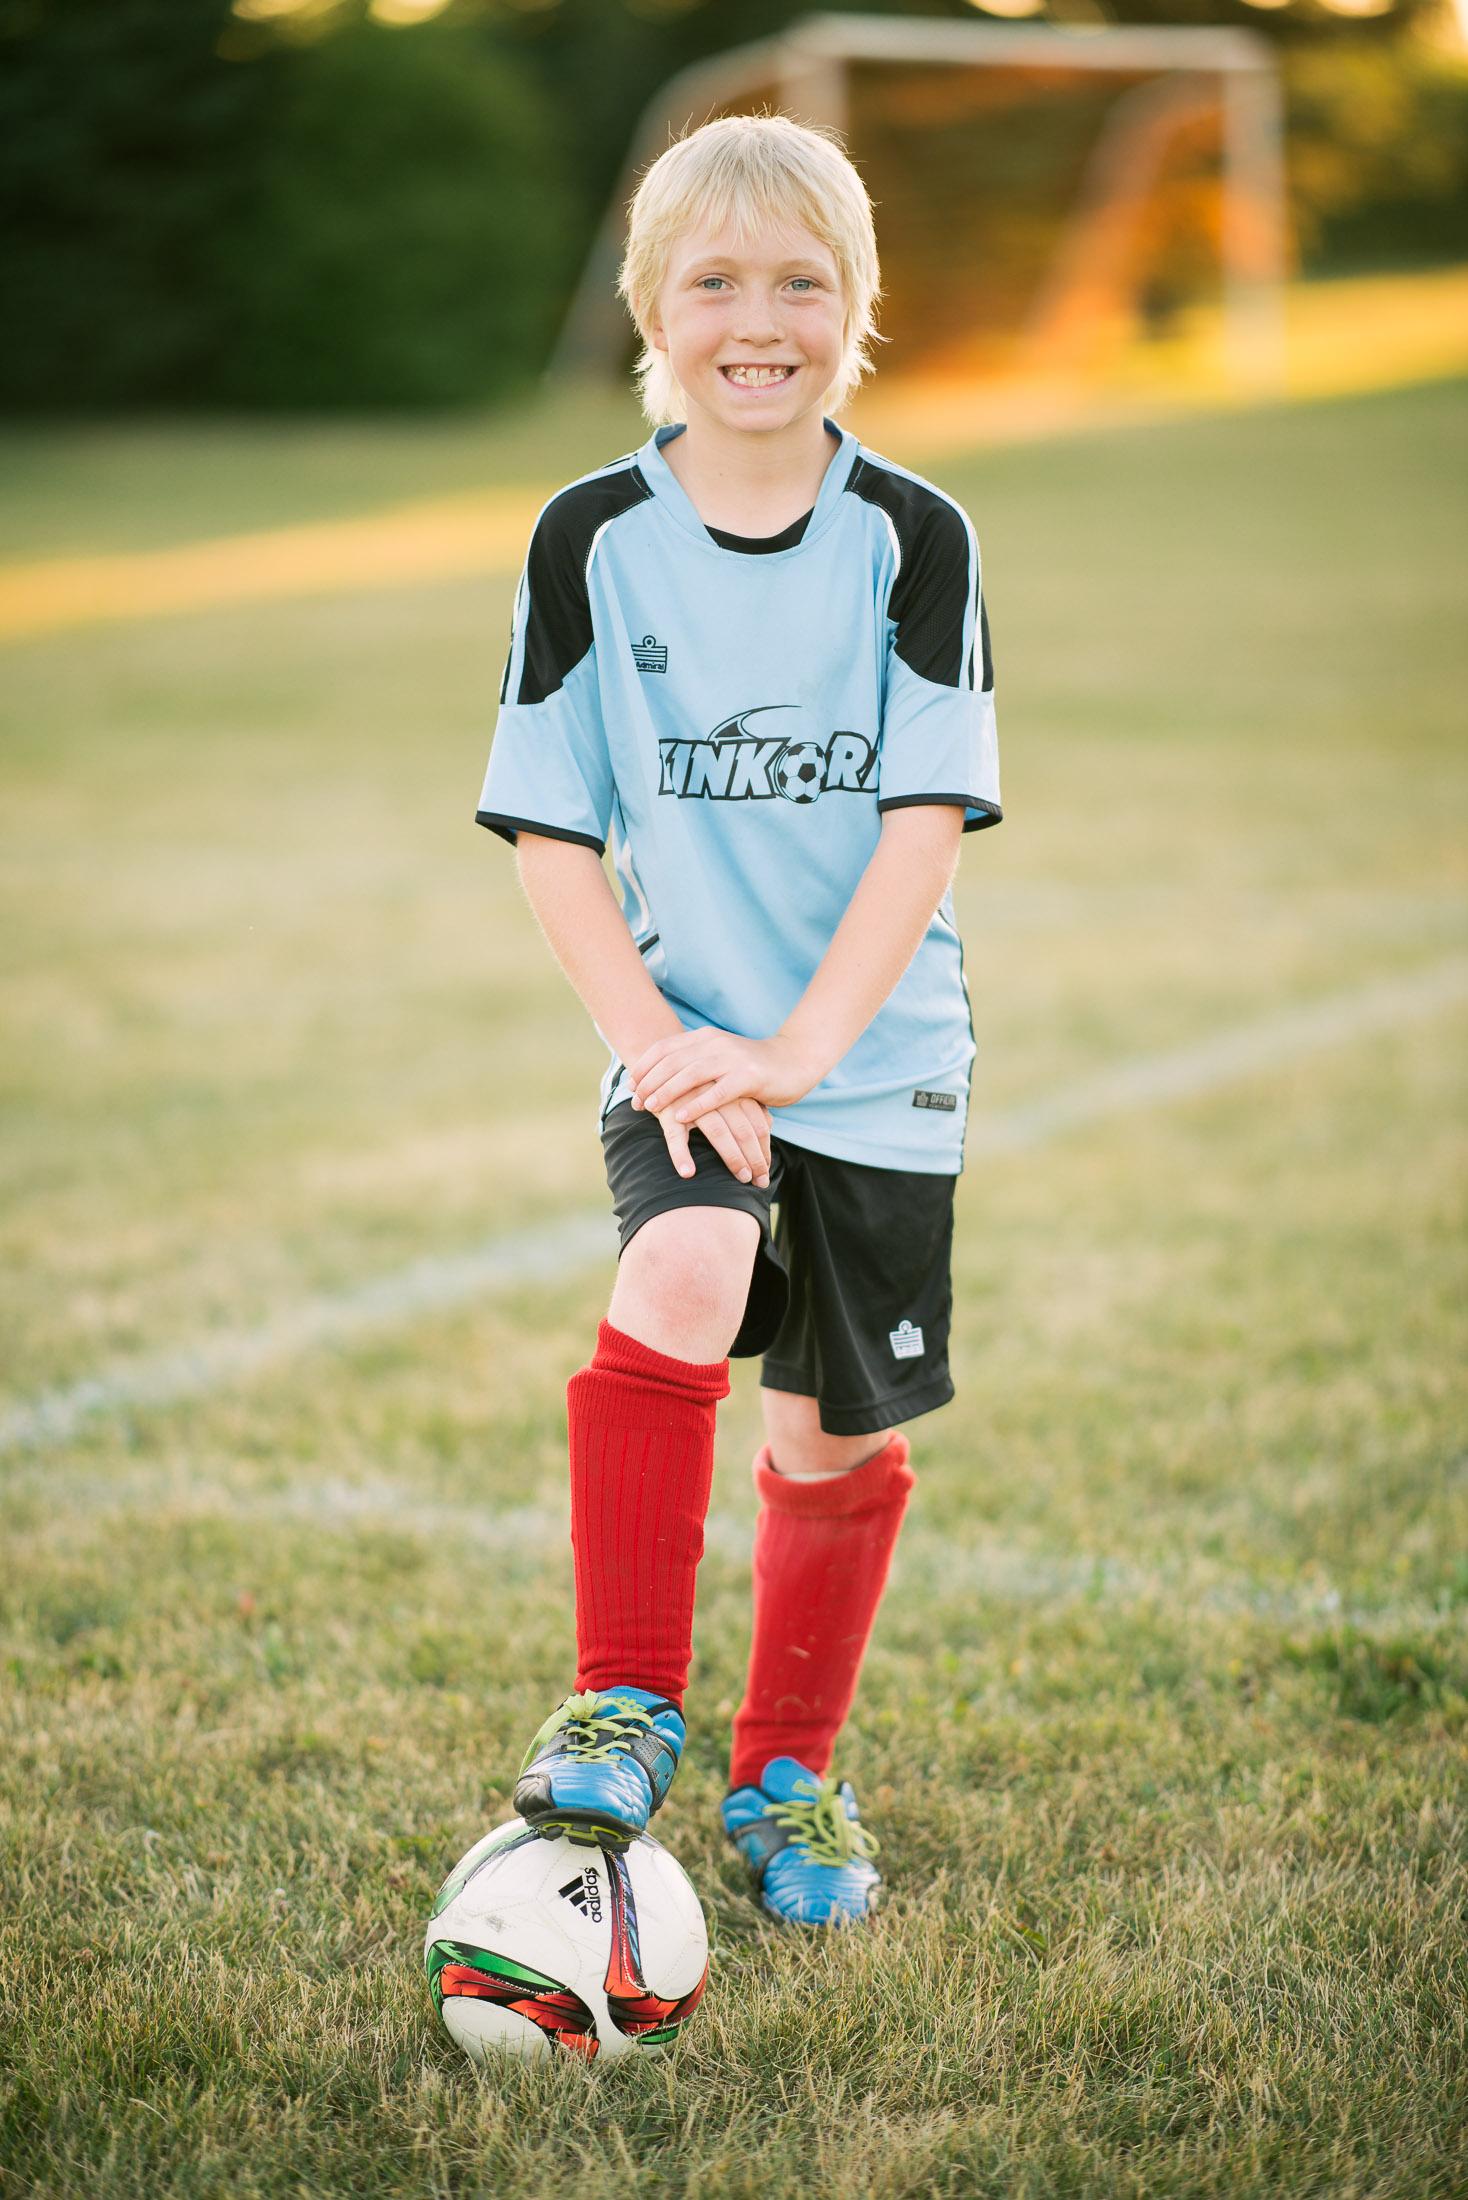 Kinkora-Soccer-Photos-075.jpg